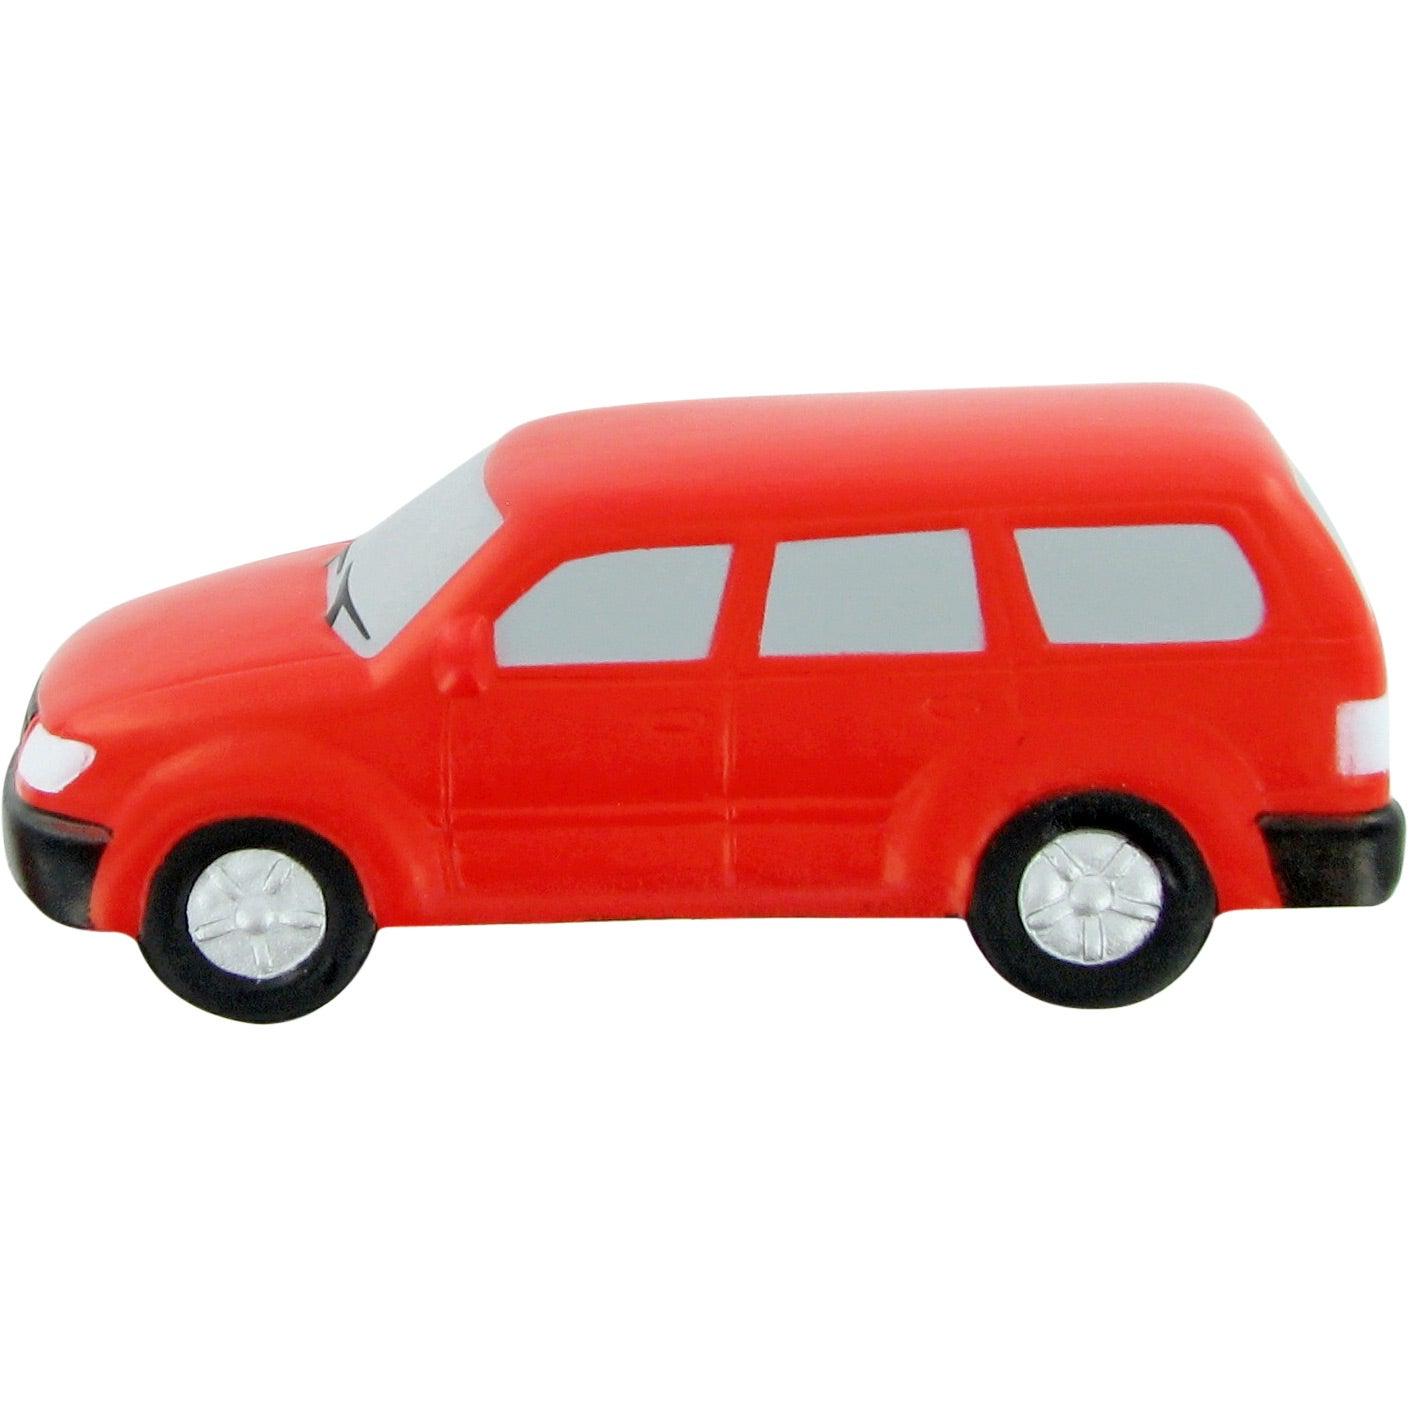 SUV Stress Toy